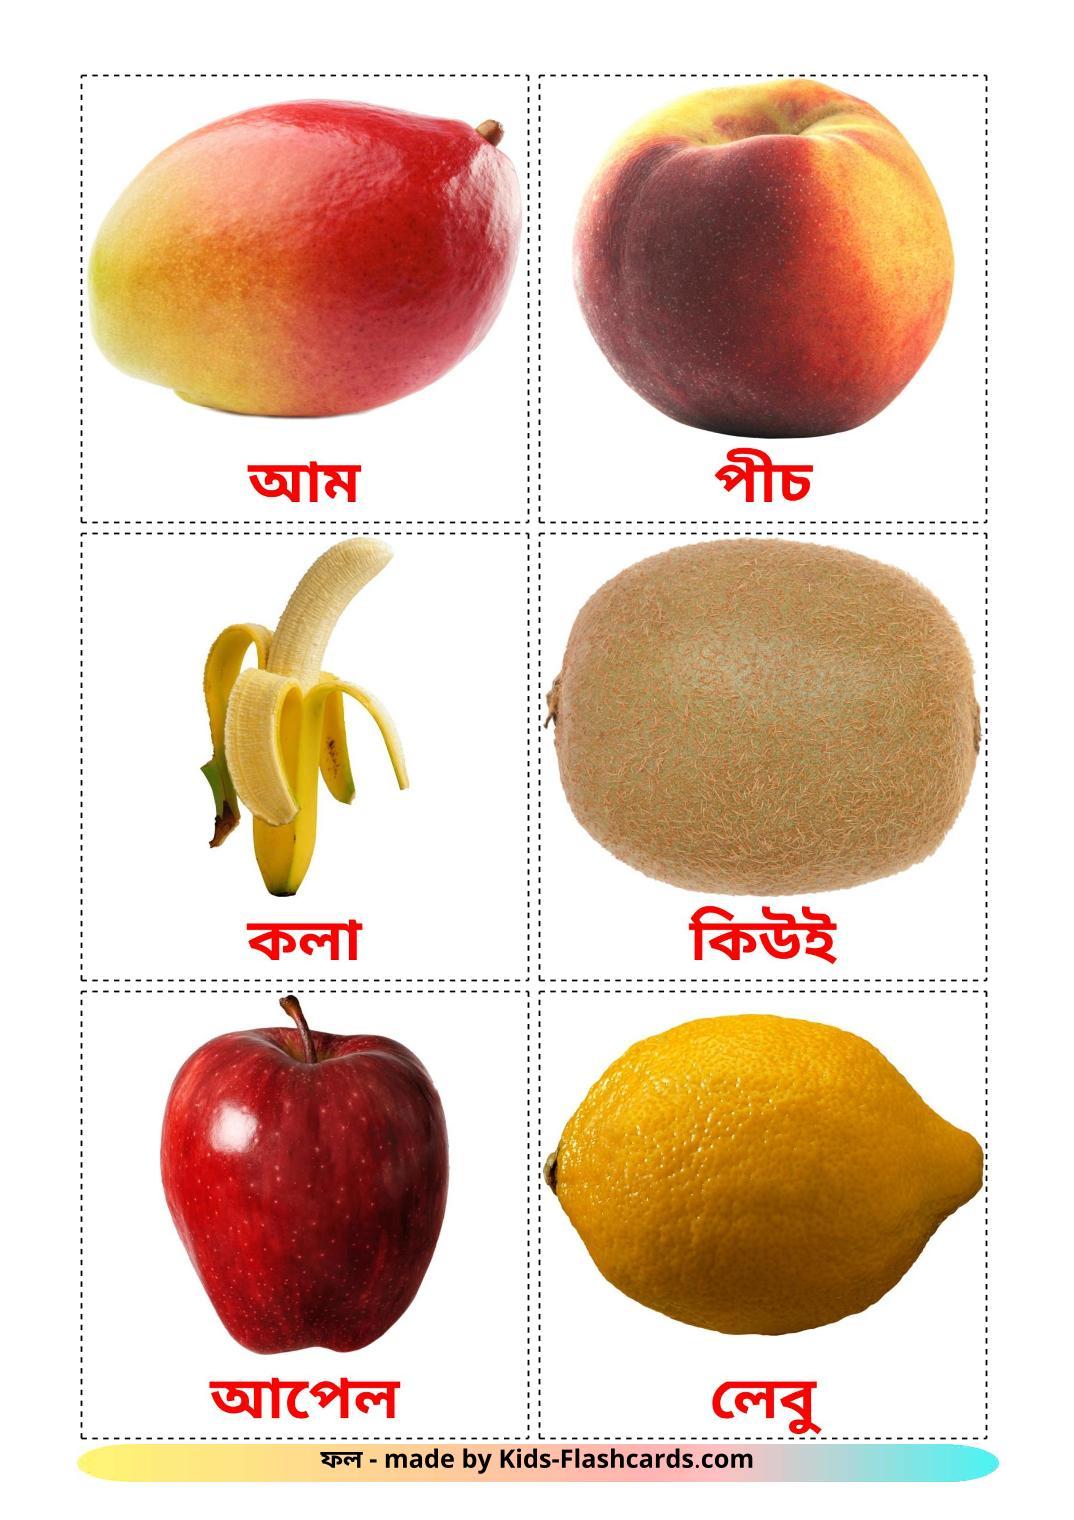 Fruits - 20 Free Printable bengali Flashcards